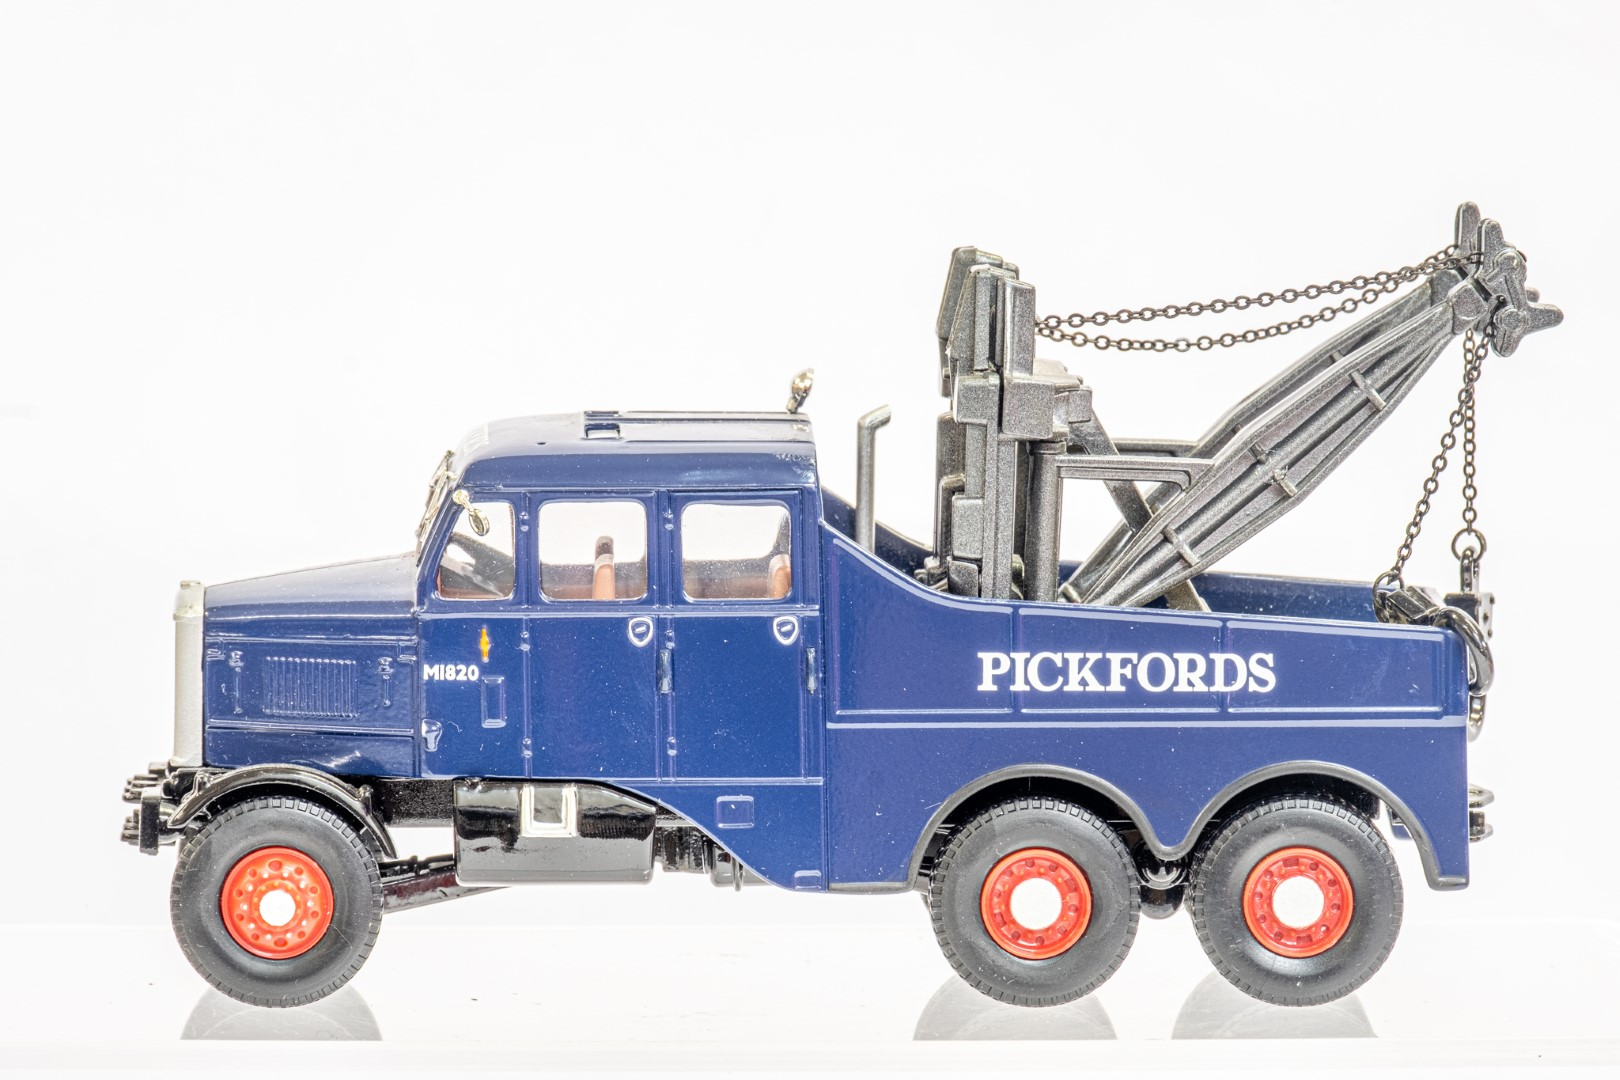 Corgi Pickfords Scammell Constructor Wrecker - Image 4 of 8